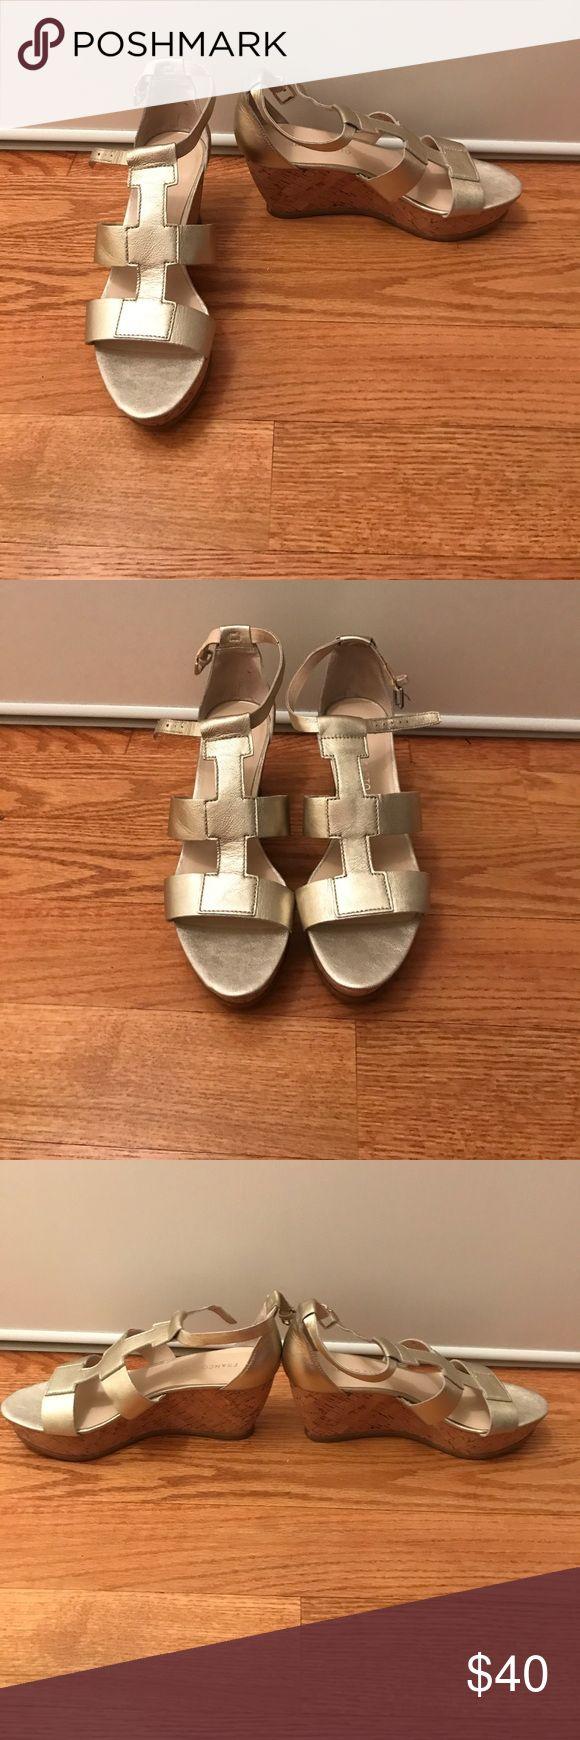 "Franco Sarto Gold Wedge Heels - NWOT Franco Sarto Gold Wedge Heels - NWOT- Size 8 - falco-Geometric-Inspired Upper-Platform Wedge- no box- approximately 3"" wedge in the back and 1"" in the front Franco Sarto Shoes Wedges"